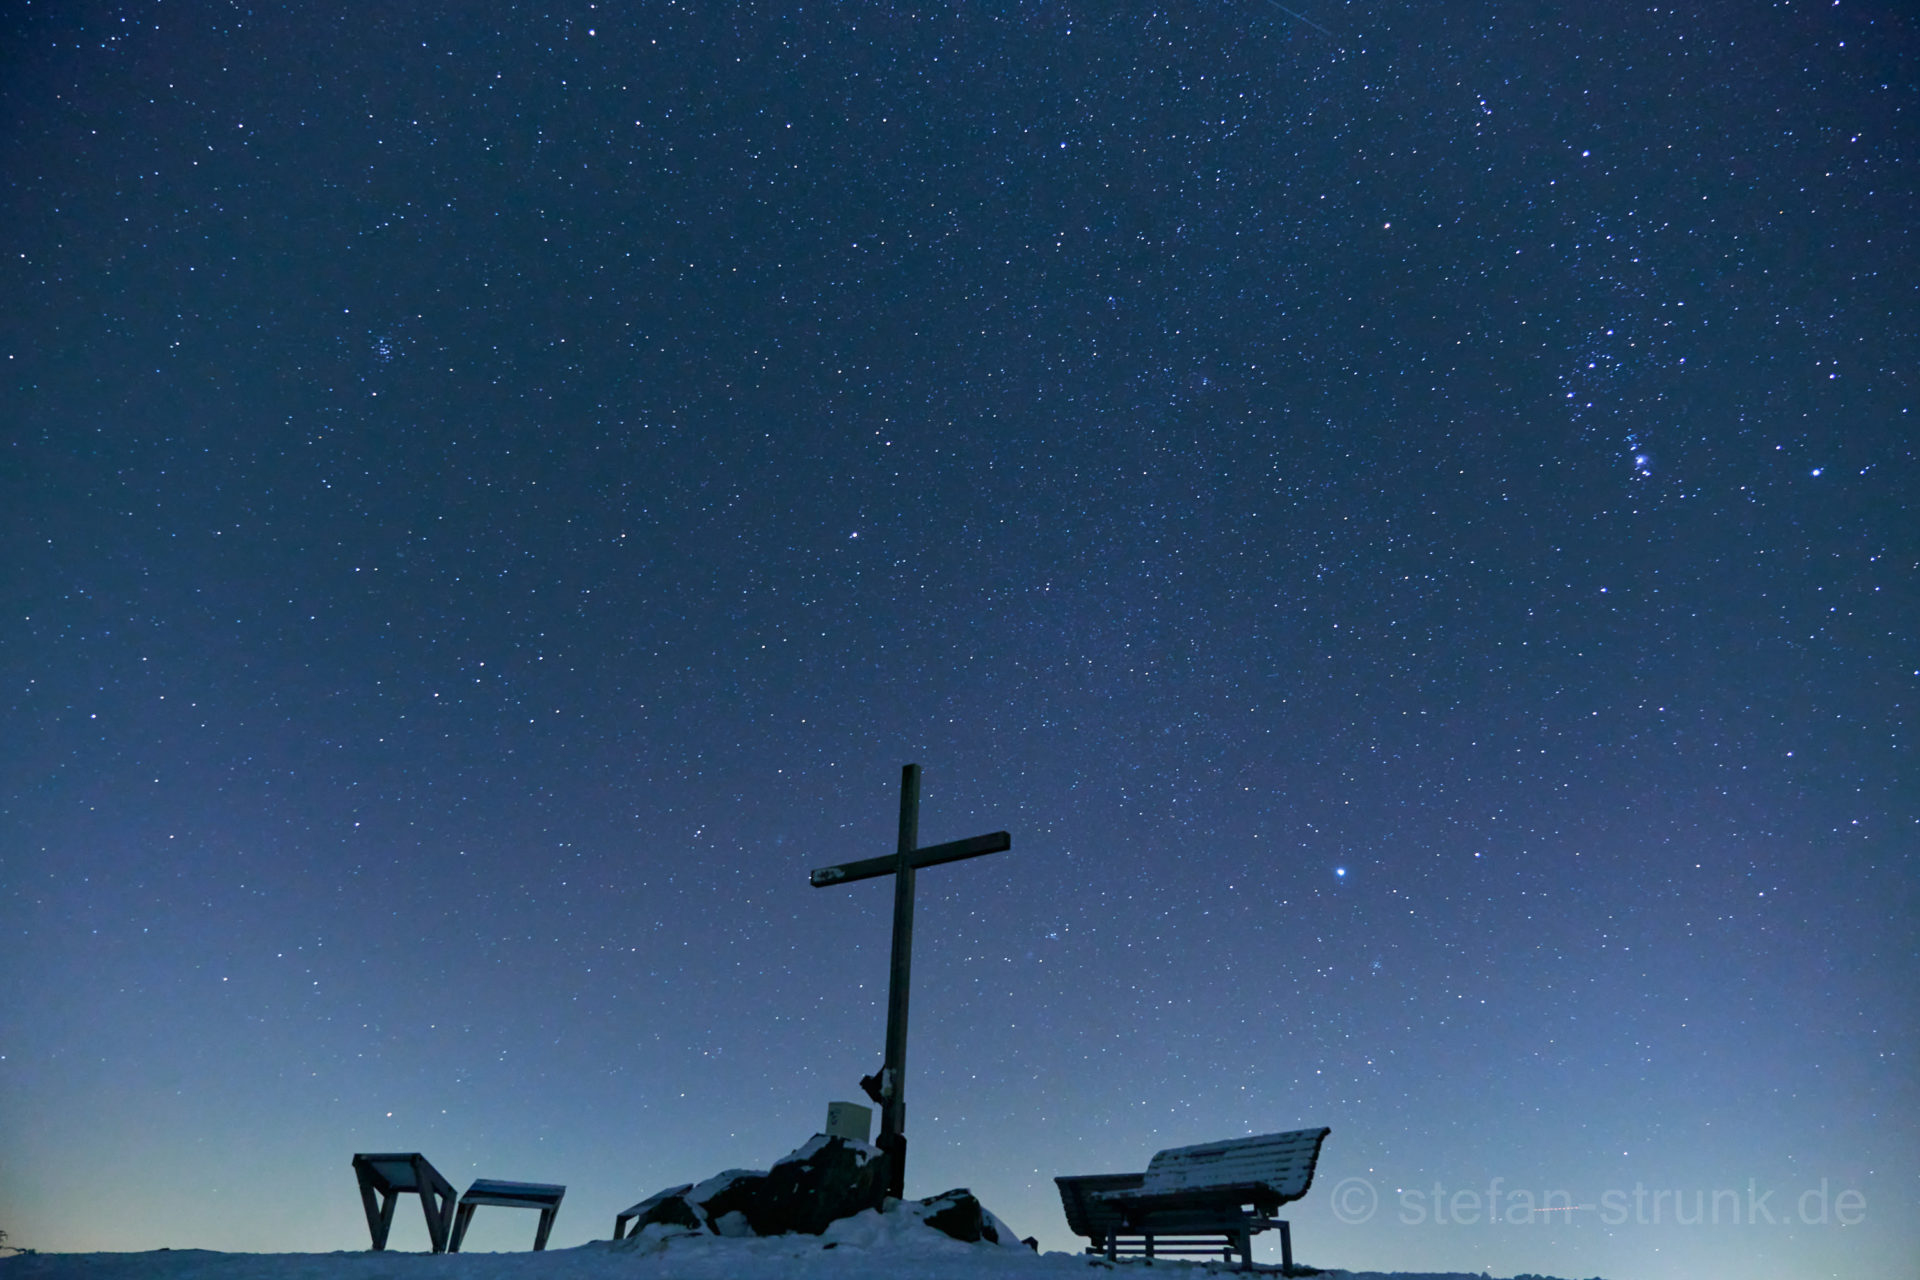 Stefan Strunk - Nightphotography